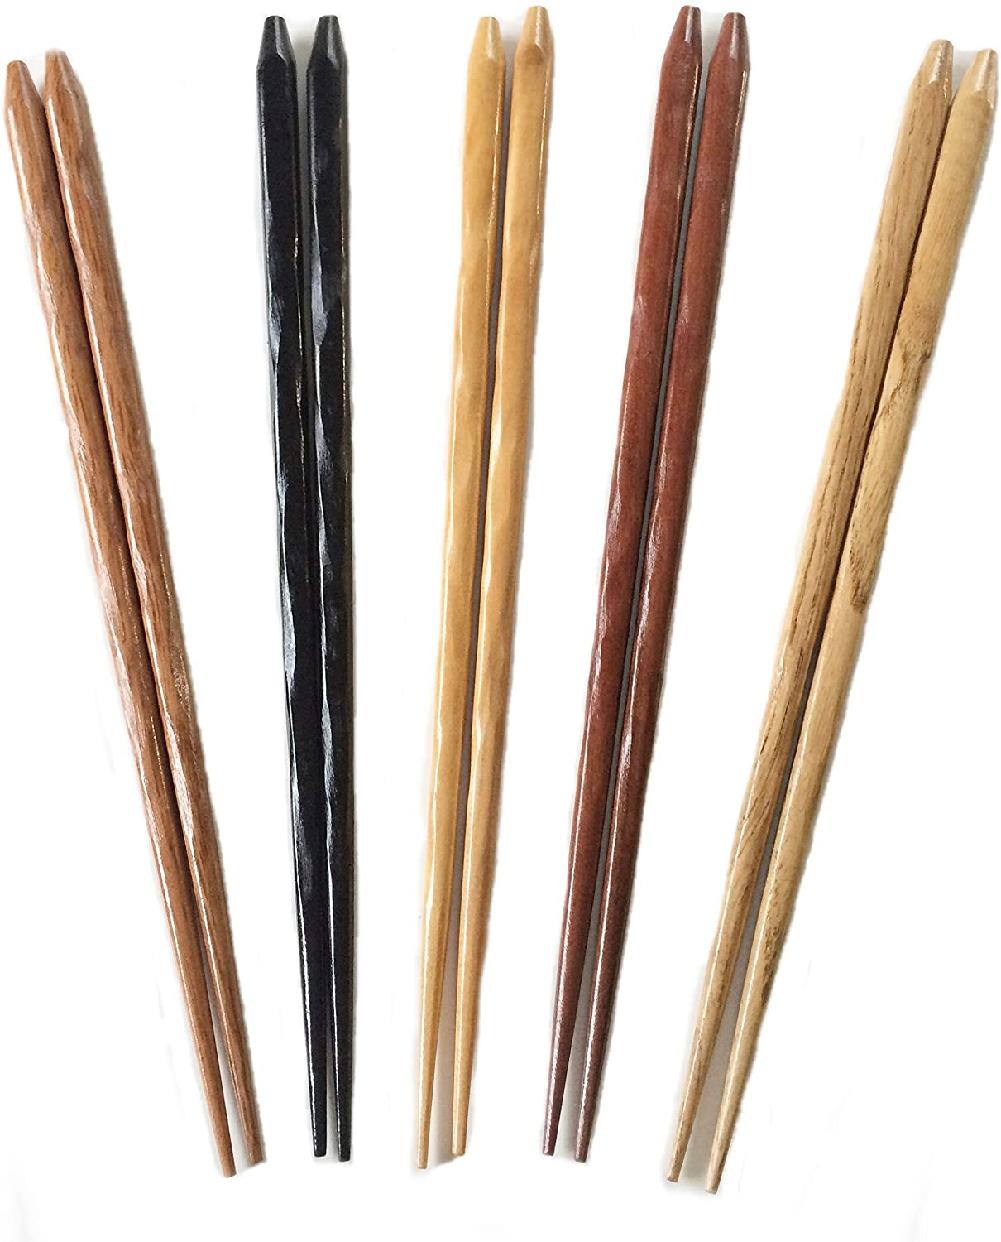 tawatawa(タワタワ) お箸 5膳セットの商品画像